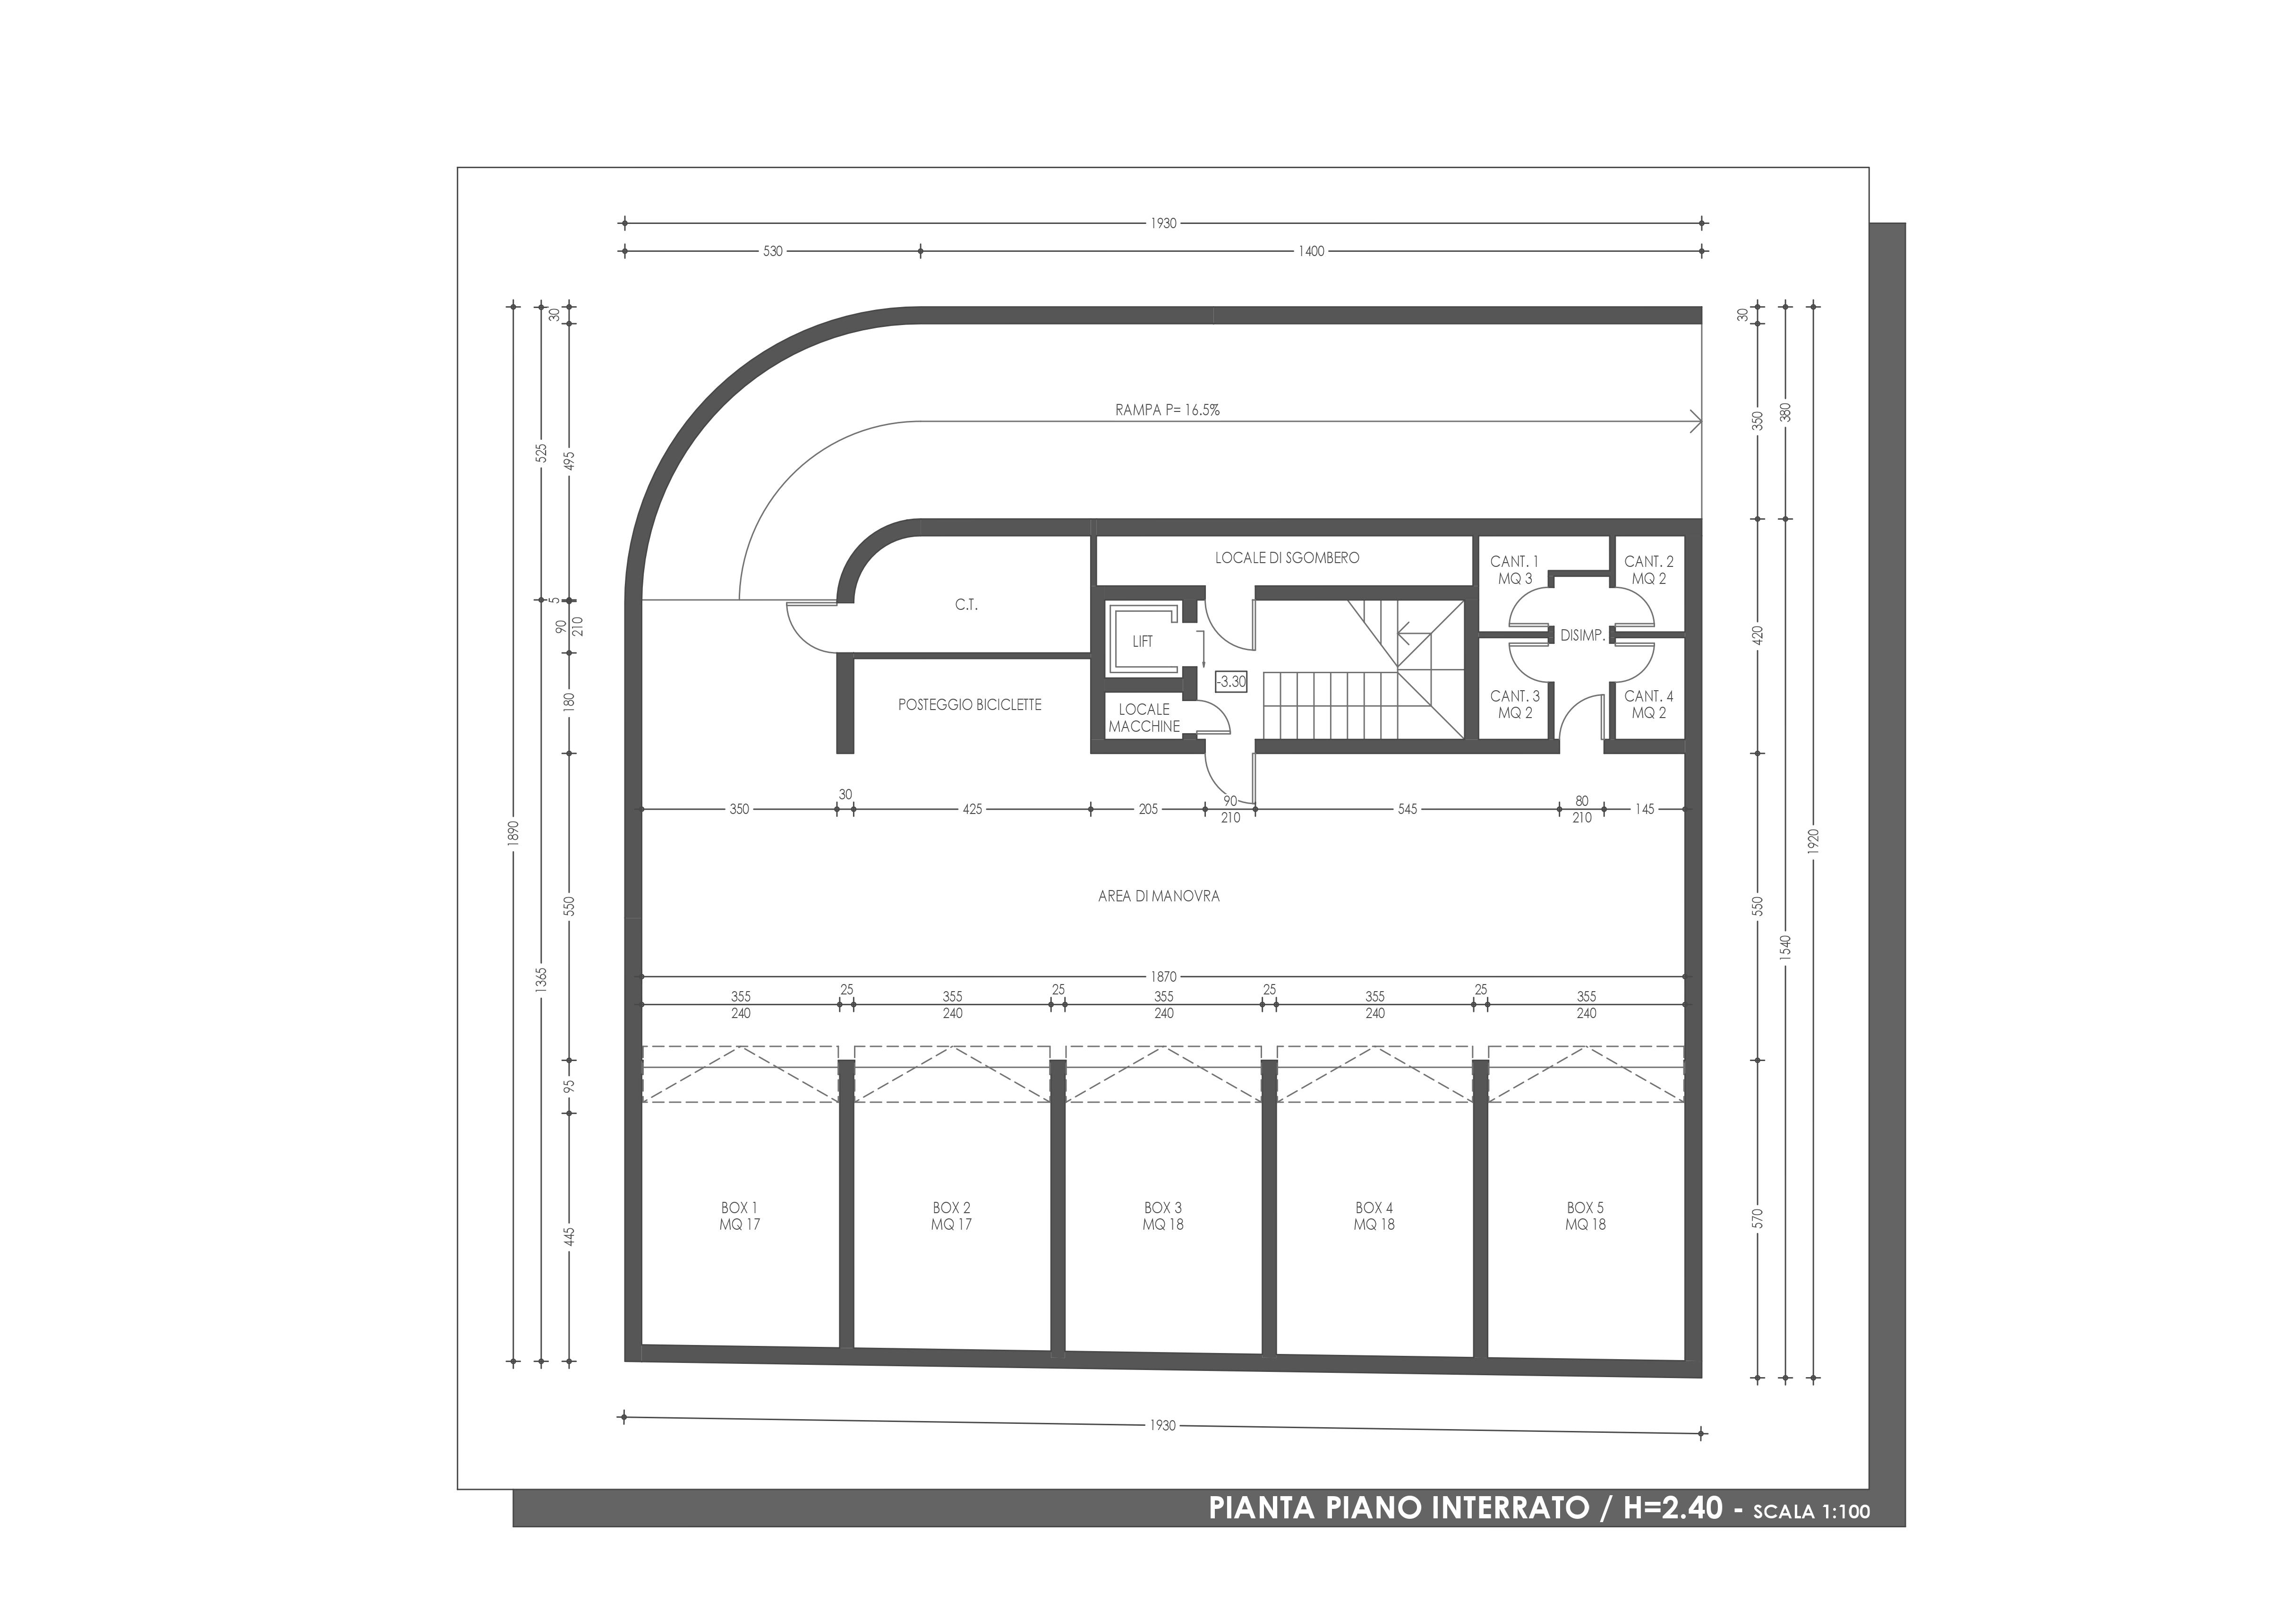 PT-APPARTAMENTO-2_101-page-002